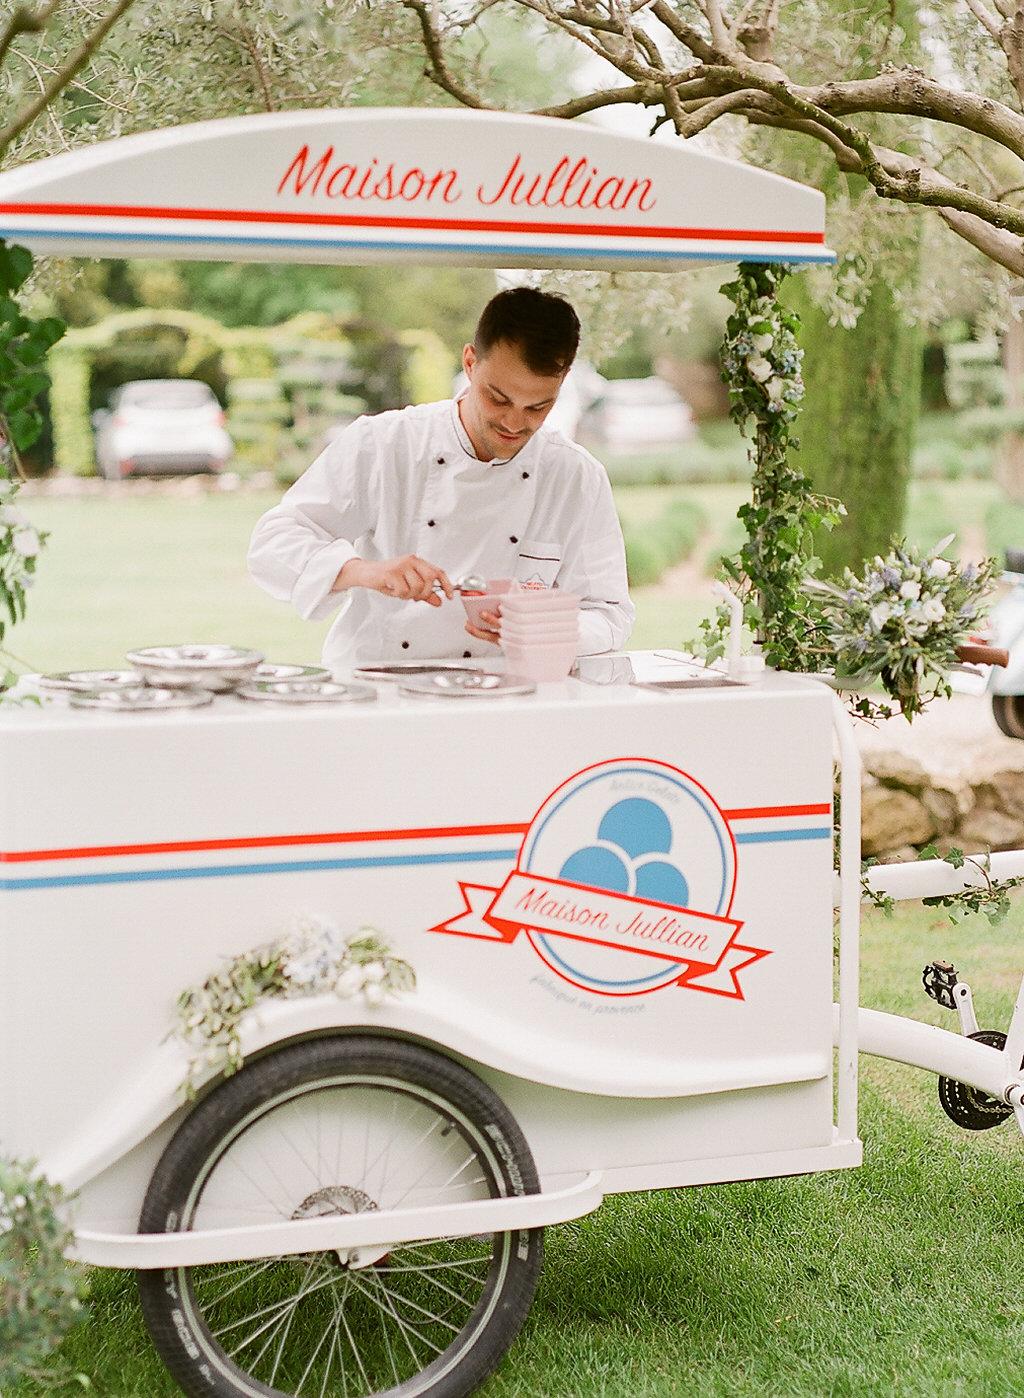 le coeur dans les etoiles - wedding planner - provence - luberon - alpilles - drome - vaucluse - sardaigne - italie - organisation - mariage - shooting - dolce vita - valery villard-336